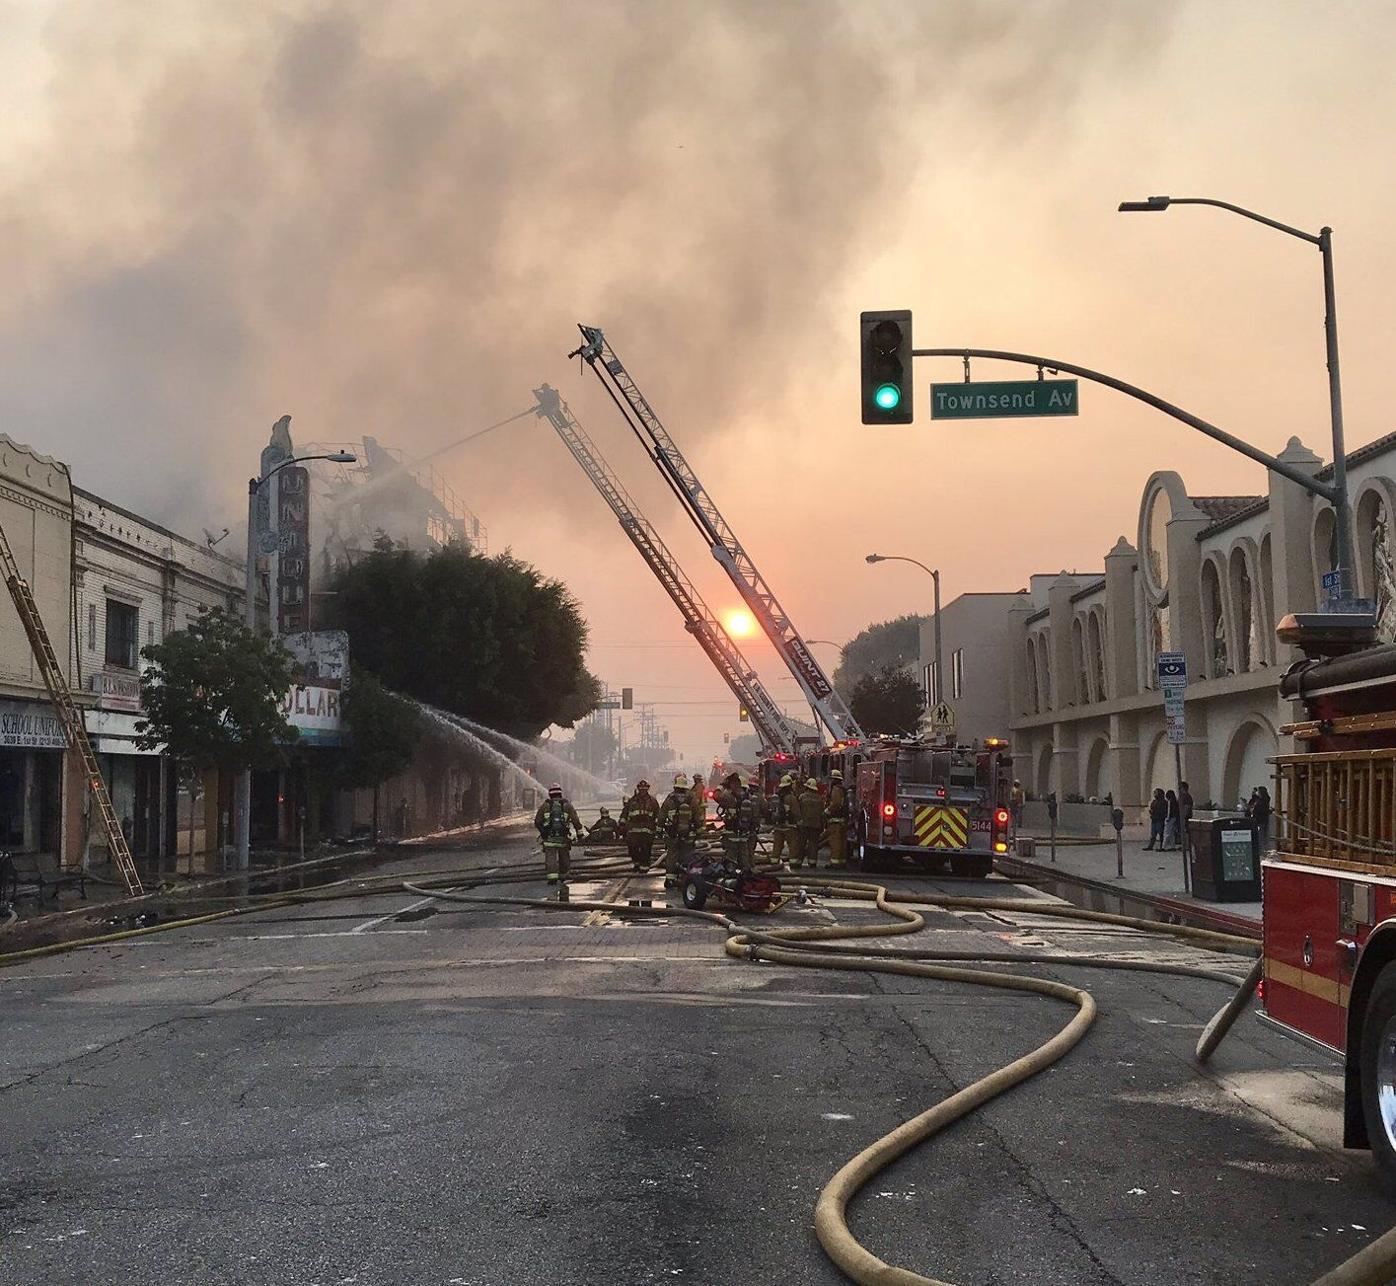 1st and Rowan apartment fire